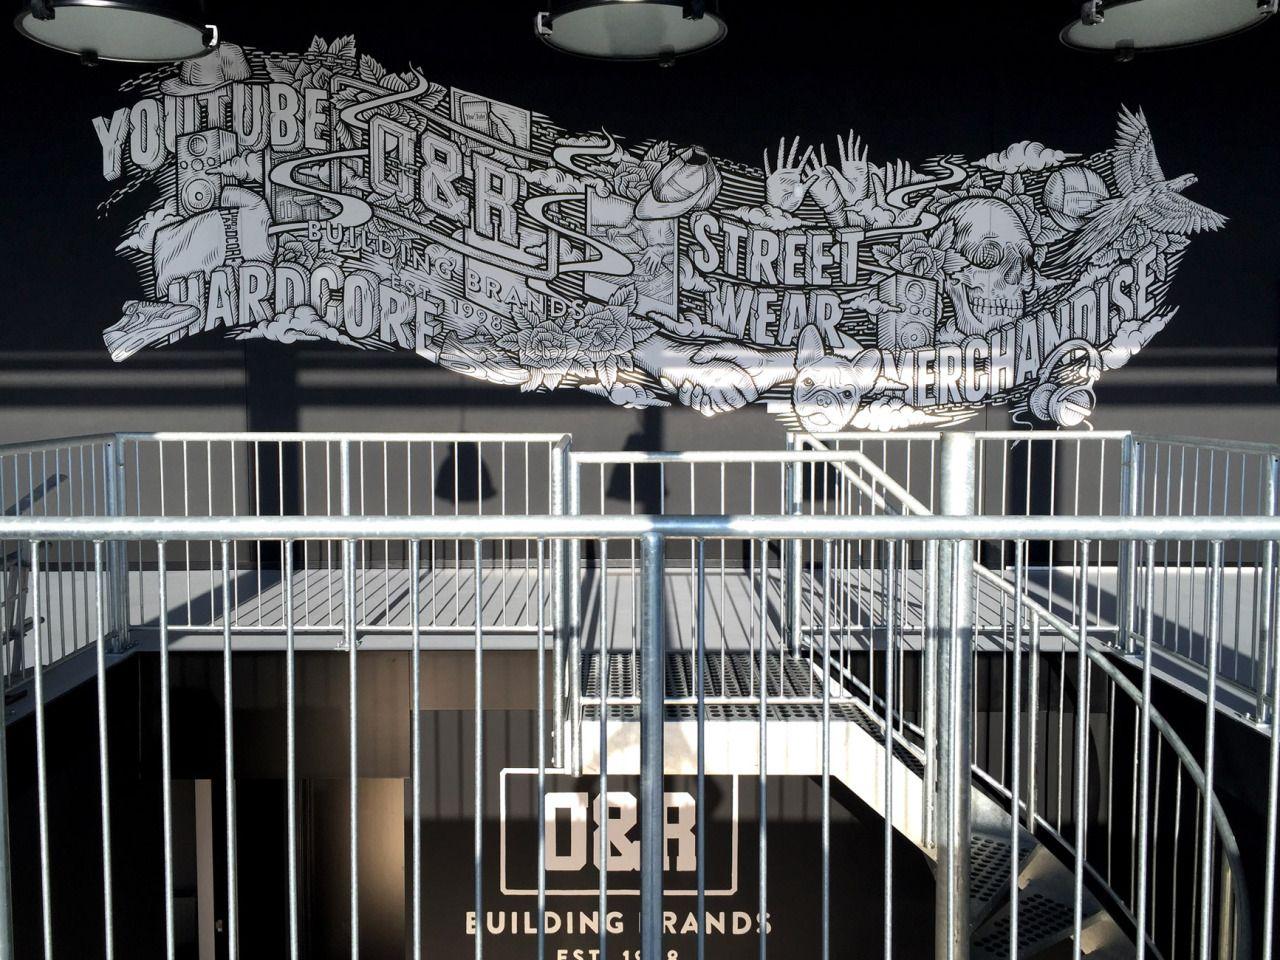 Handpainted Mural at O&R Building Brands. By Ralf van de Kerkhof, Rotterdam, Holland.    Amsterdam, Rotterdam, vintage illustration, crosshatch, portraid illustration, drawing, artwork, crosshatch, mural, muurschildering, wandschildering, woonkamer, interieur styling, wand decoratie, vtwonen, vt-wonen, poster behang, beton look